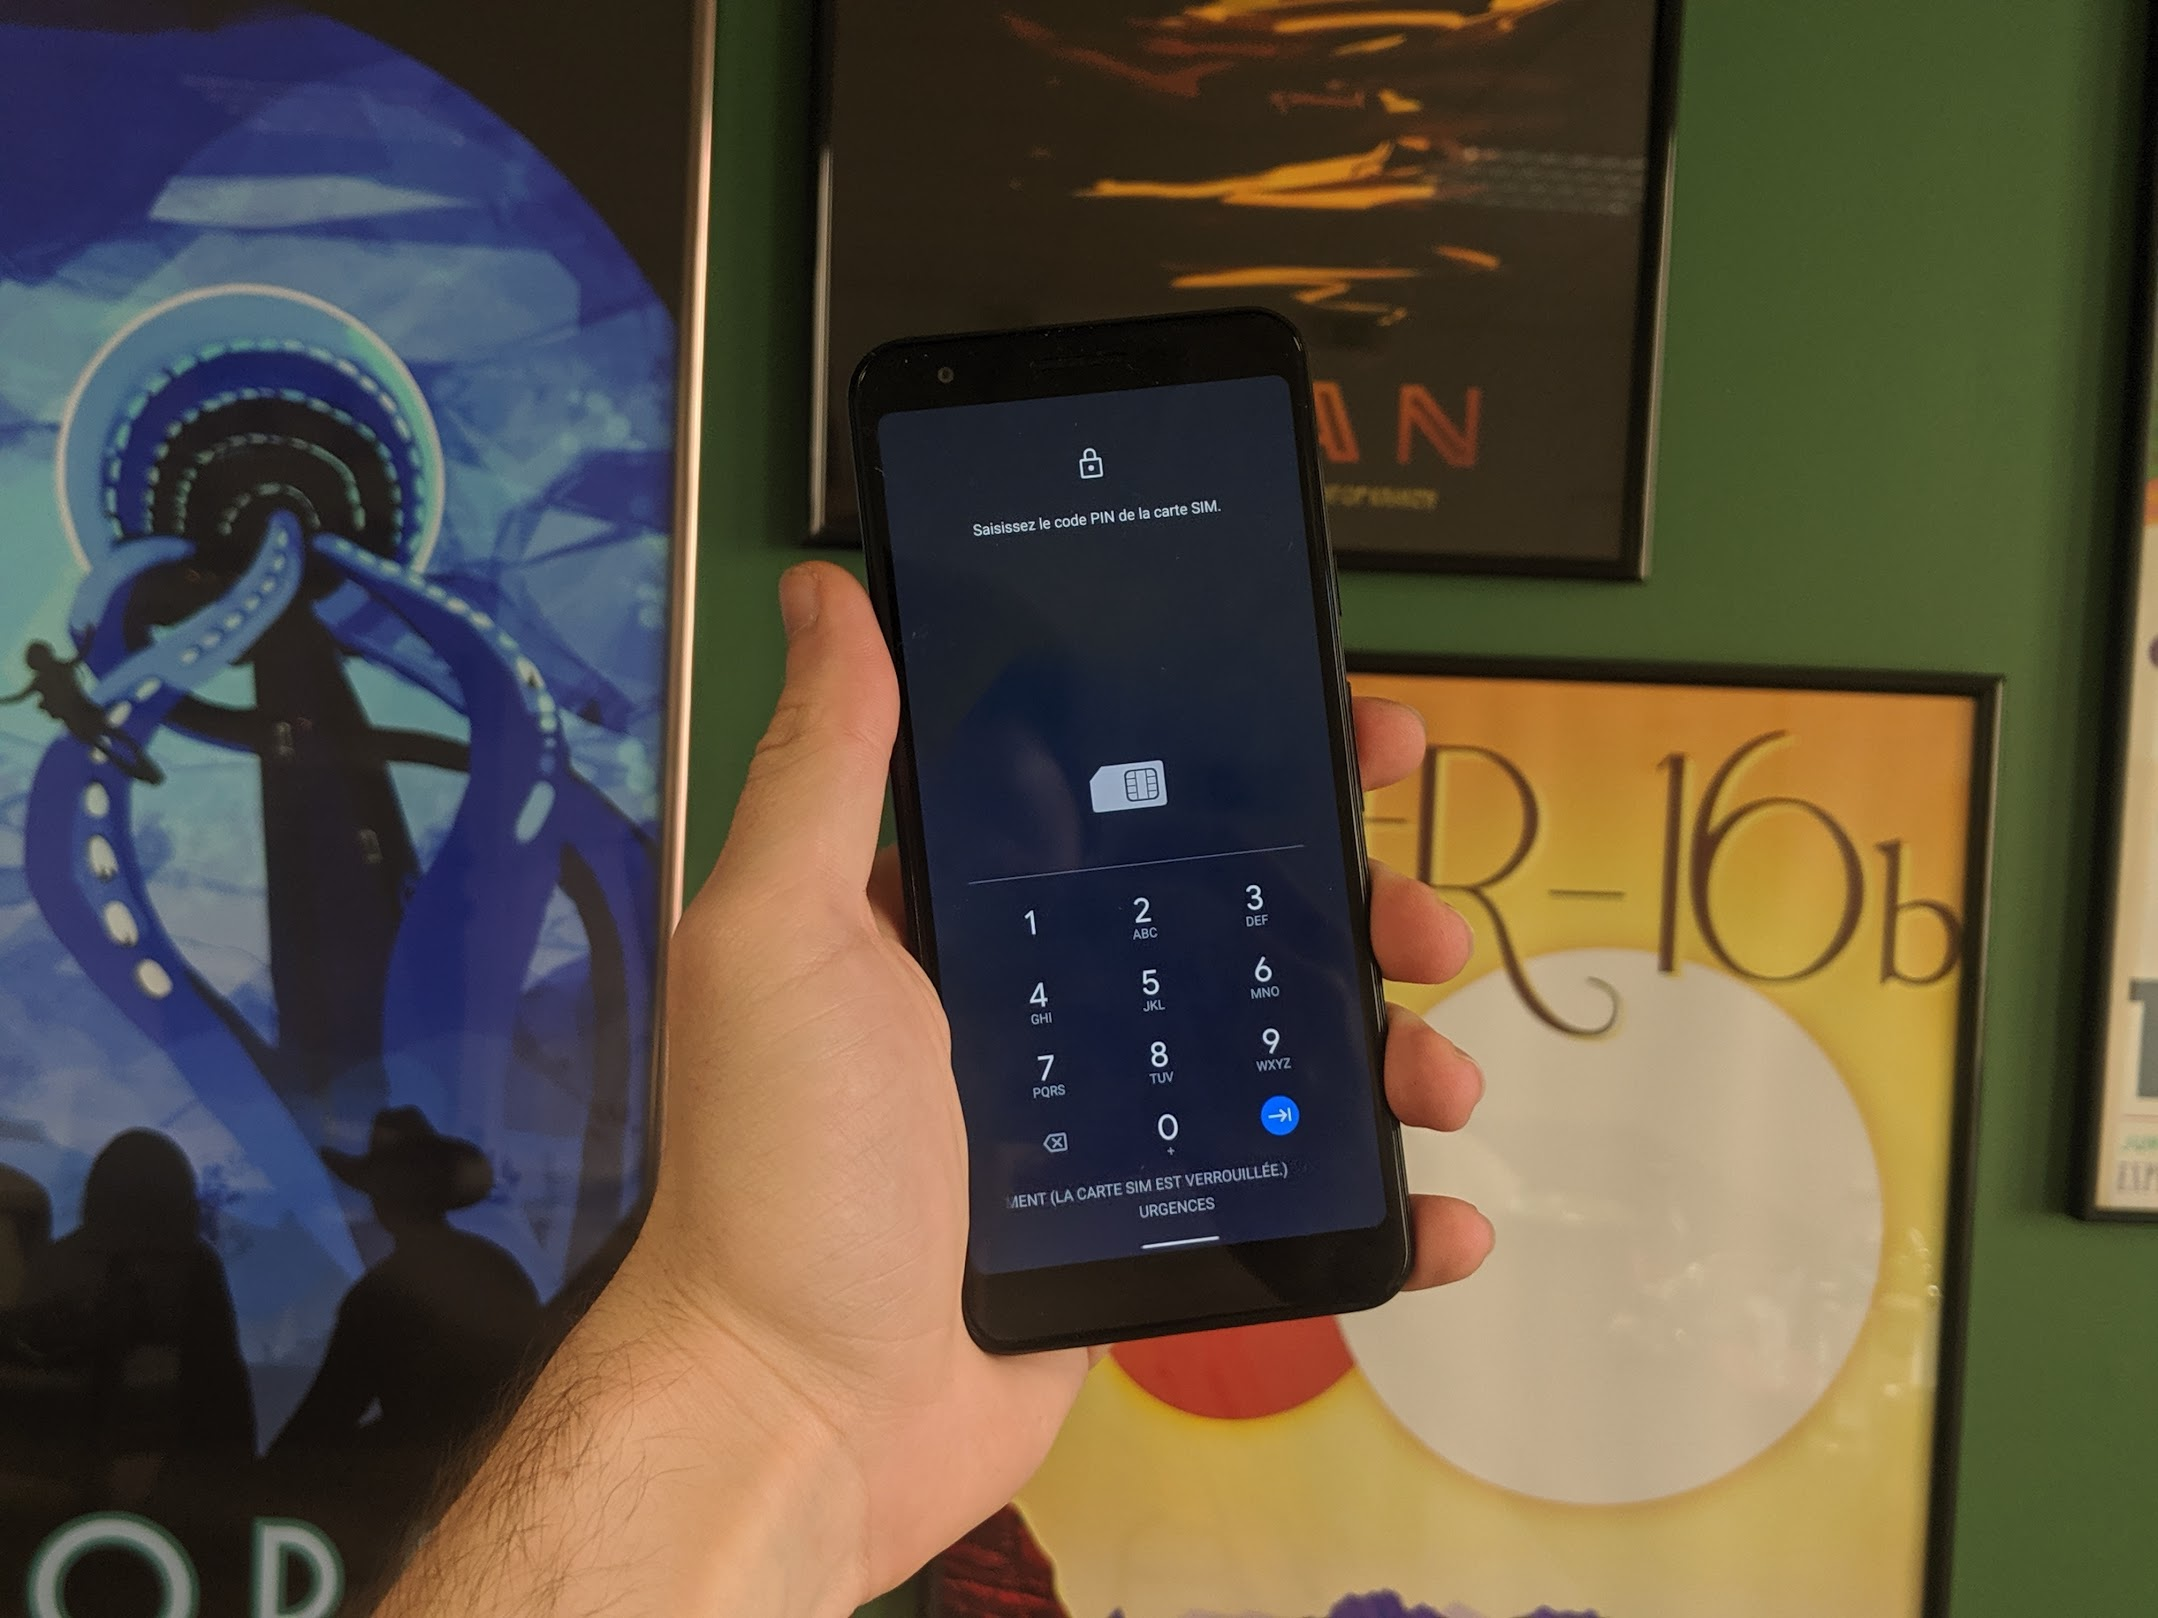 Comment Modifier Le Code Pin De Son Smartphone Android